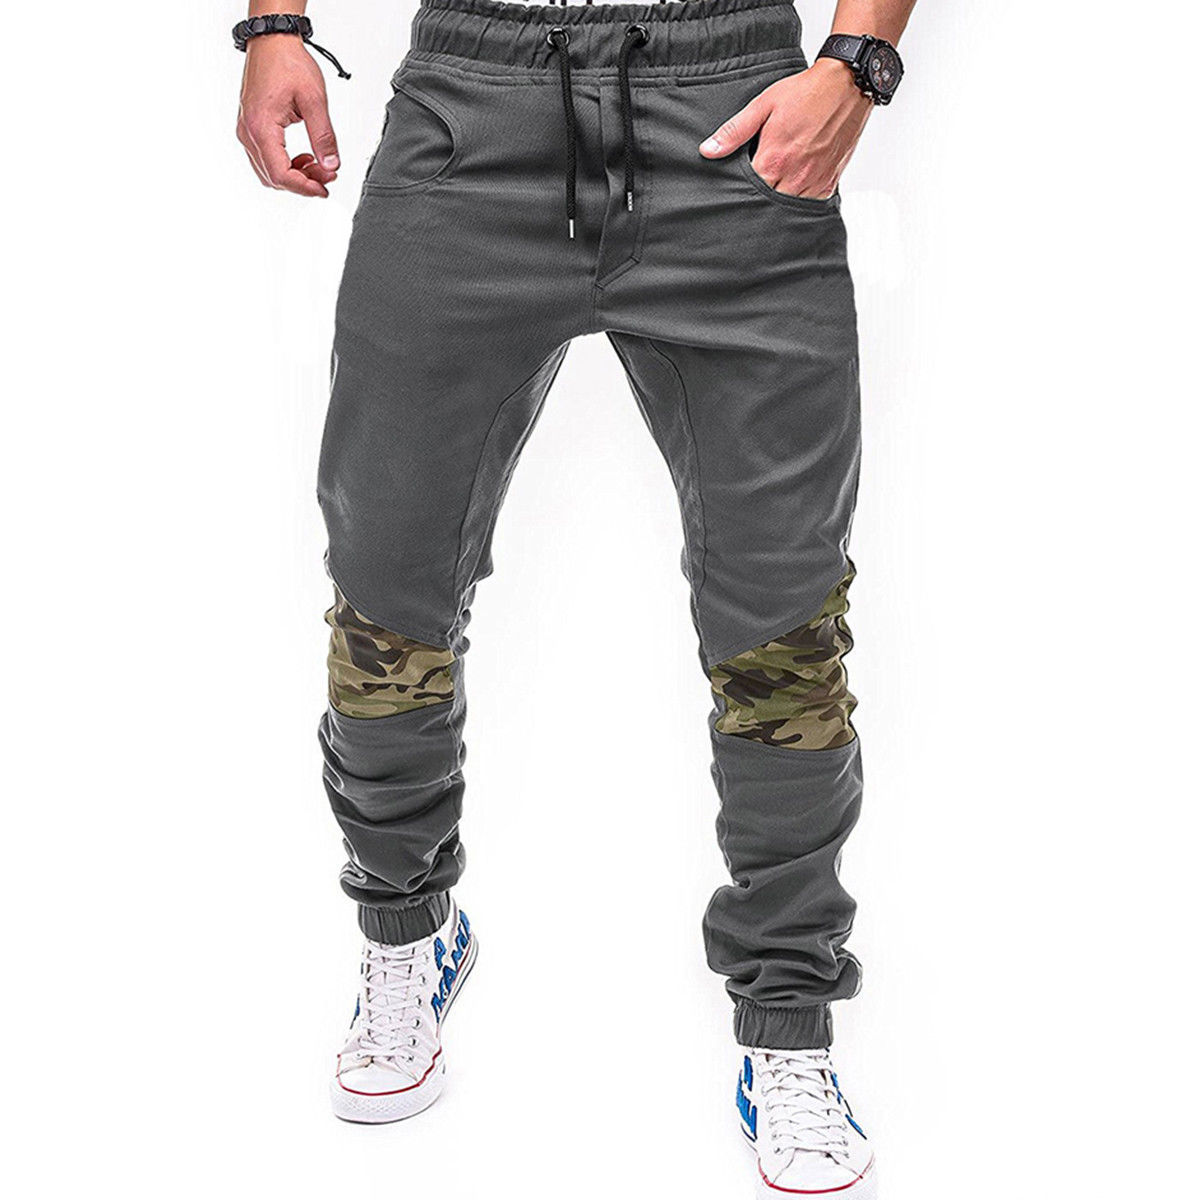 Hombres Corredor De Ropa Deportiva Casual Elegante Trabajo De Baile De Moda Pantalones Buy Men S Jogger Sportwear Baggy Casual Harem Pants Slacks Dance Sweatpants Trousers Men Sport Trousers Stylish New Design Product On